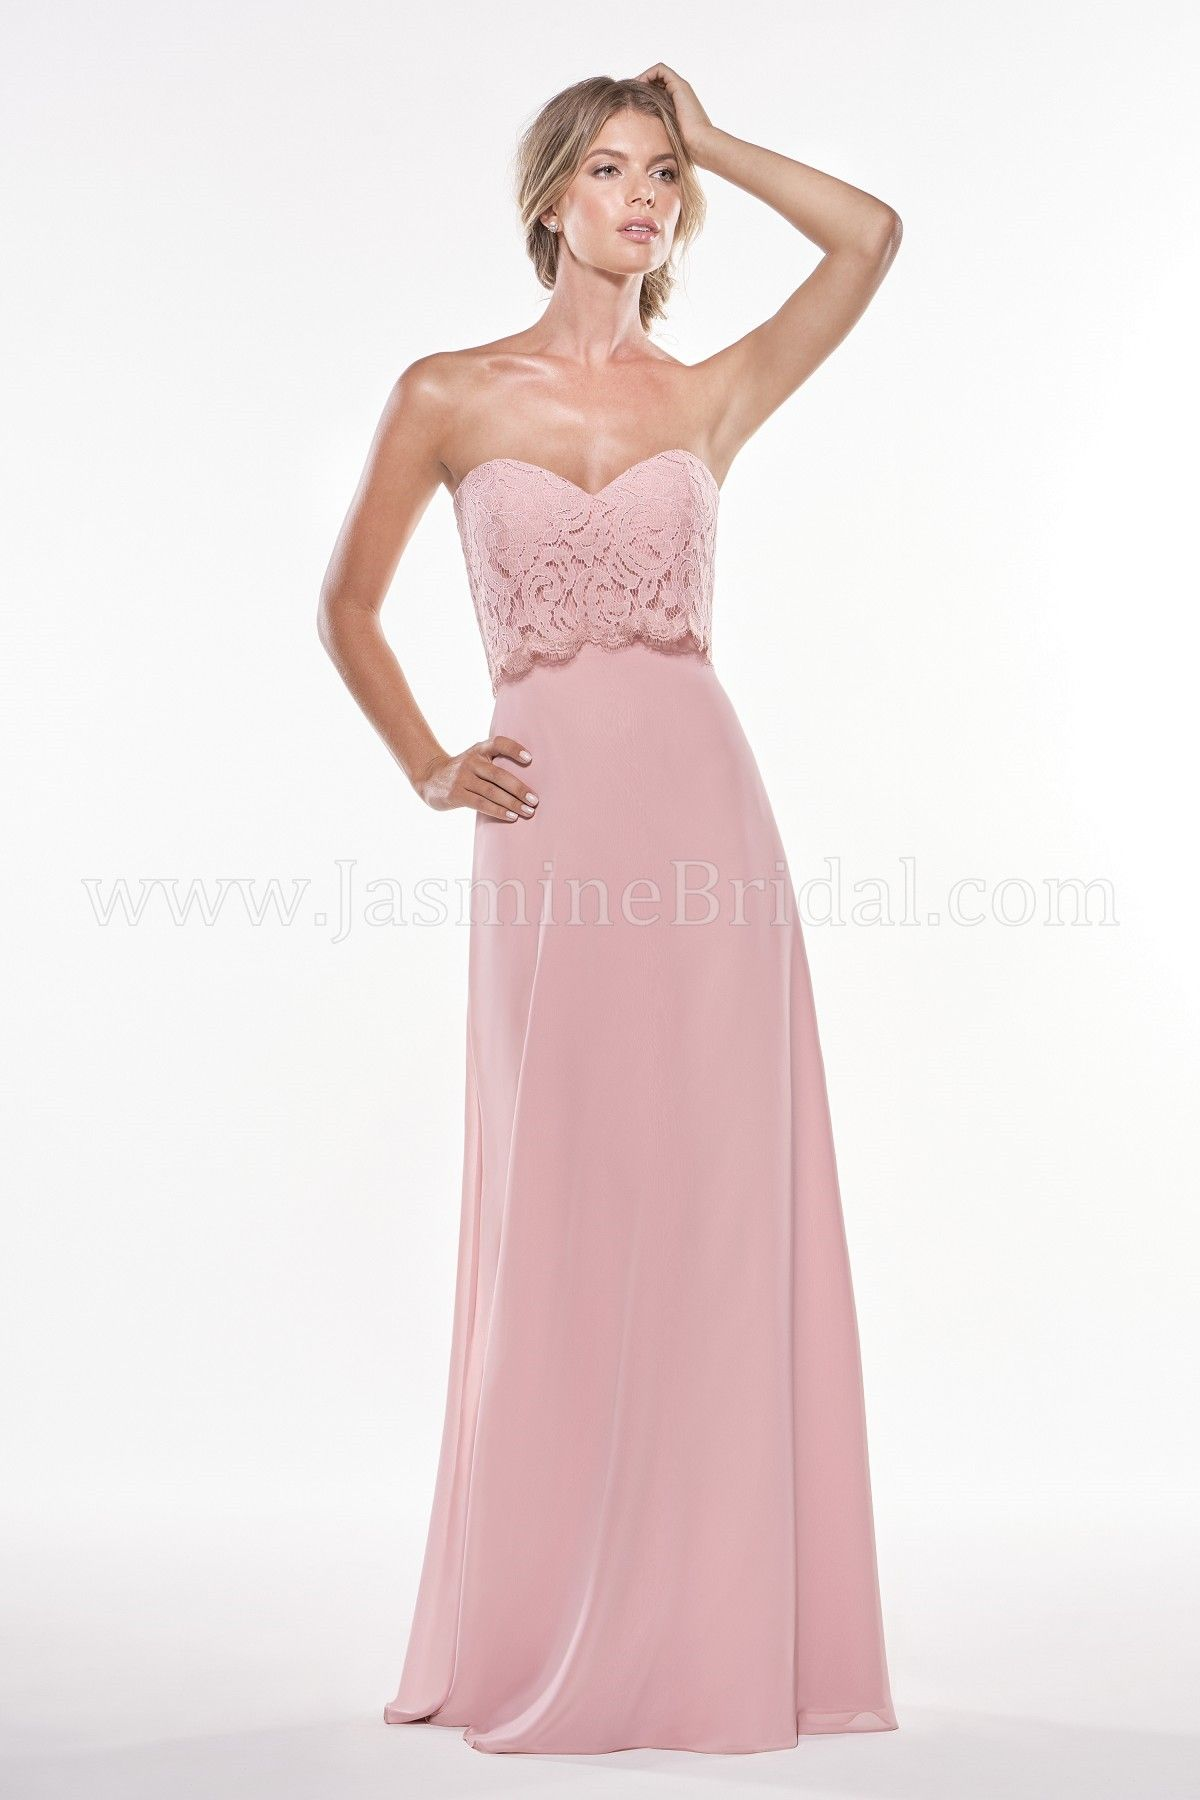 Rose colored wedding dress  Jasmine Bridal  Jasmine Bridesmaids Style P in Rose  Spring